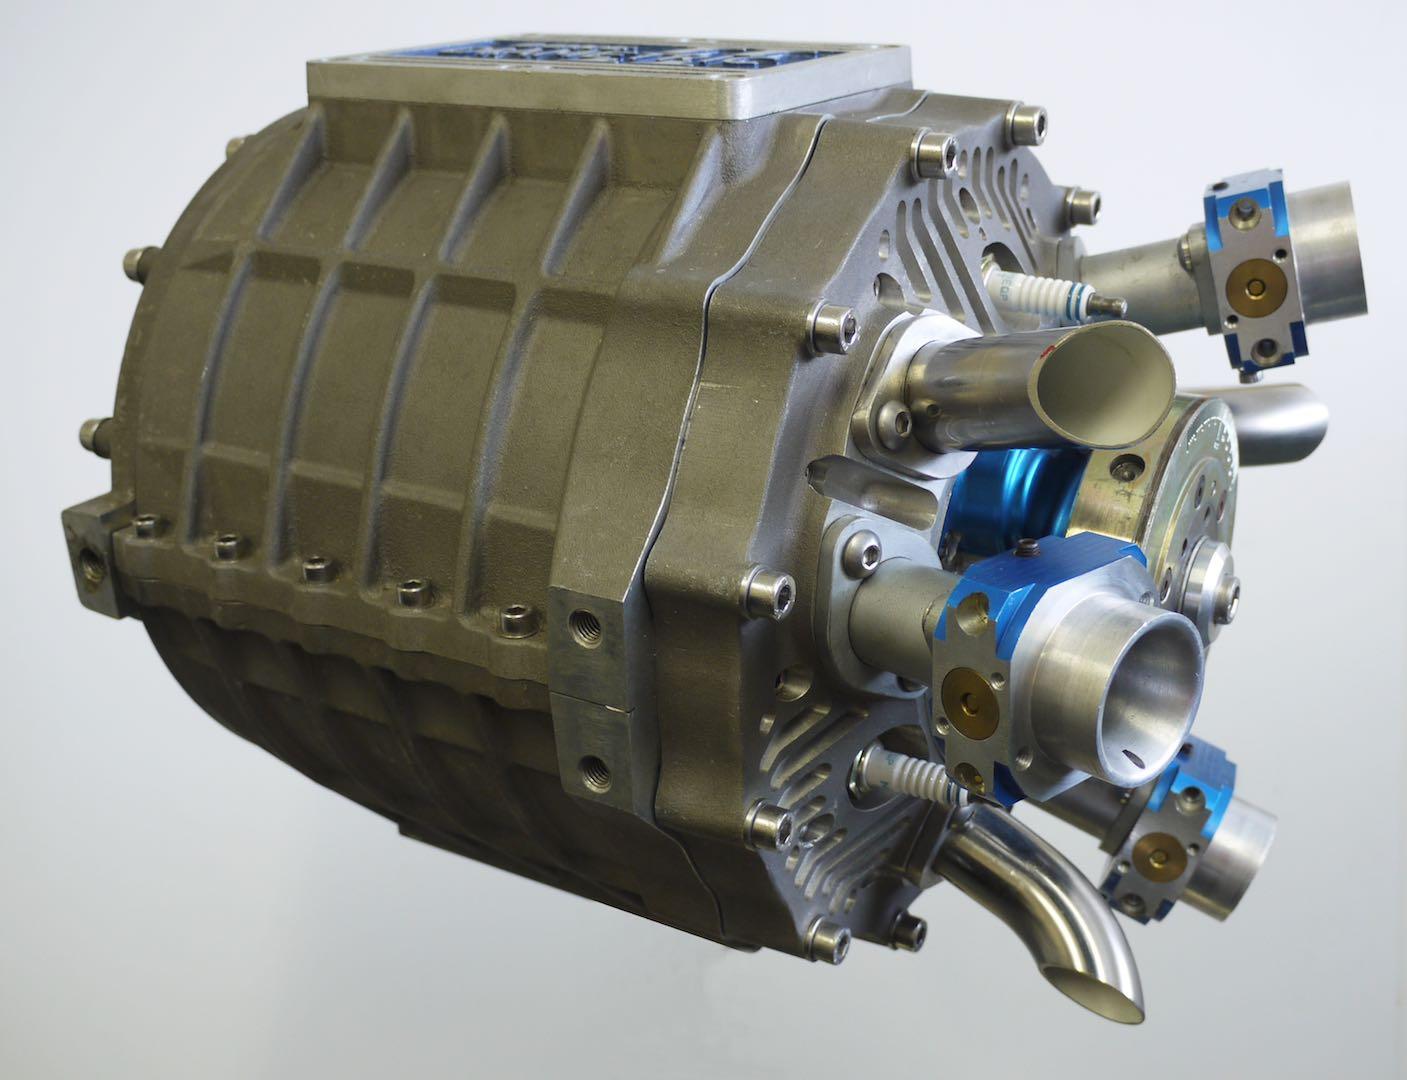 Duke Engine: Innovative Axial Piston Engine Explained